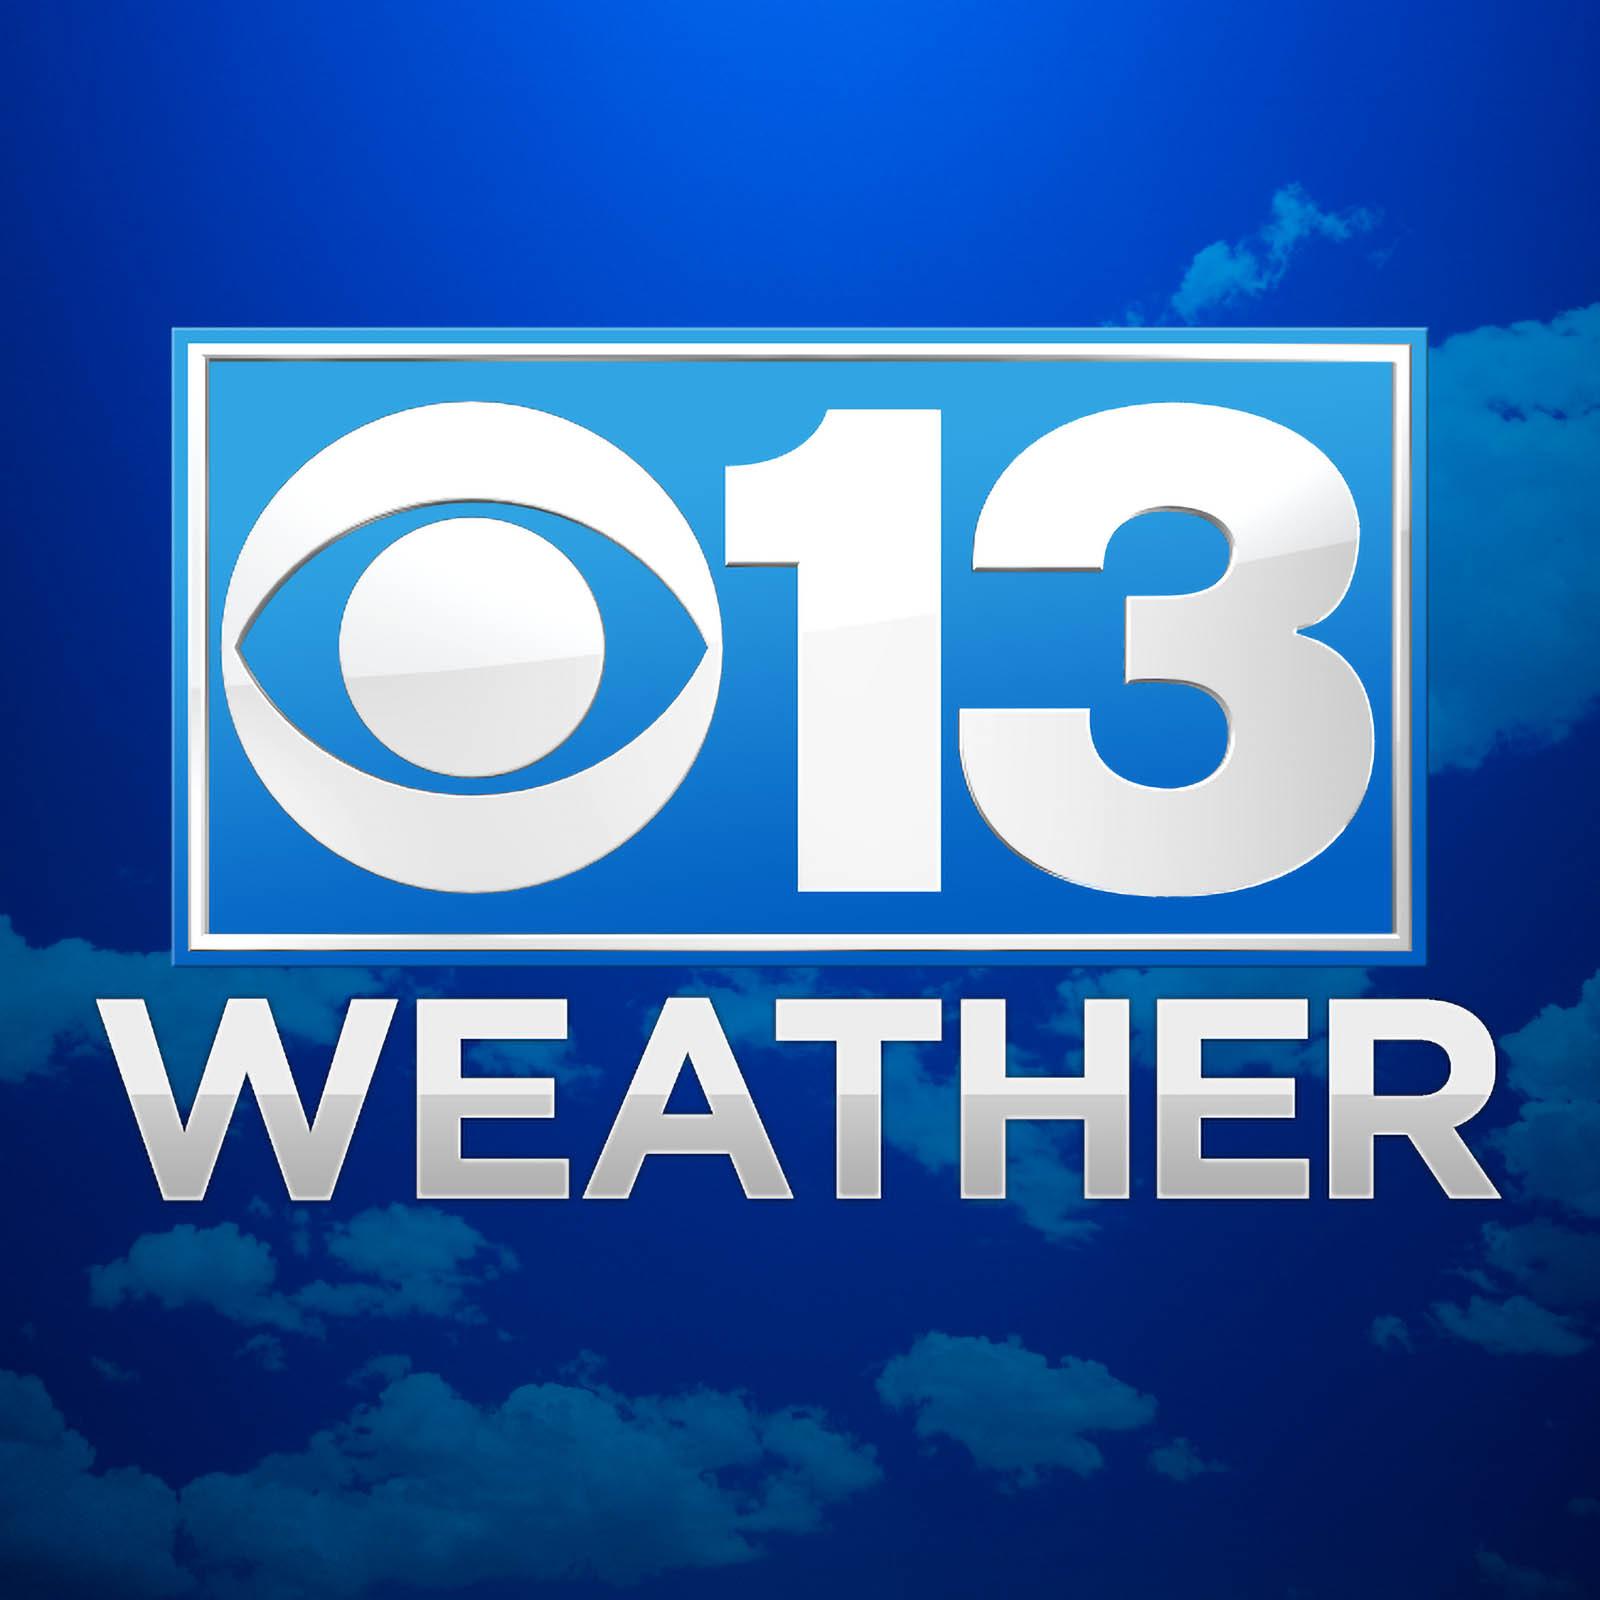 CBS 13 Sacramento weather logo